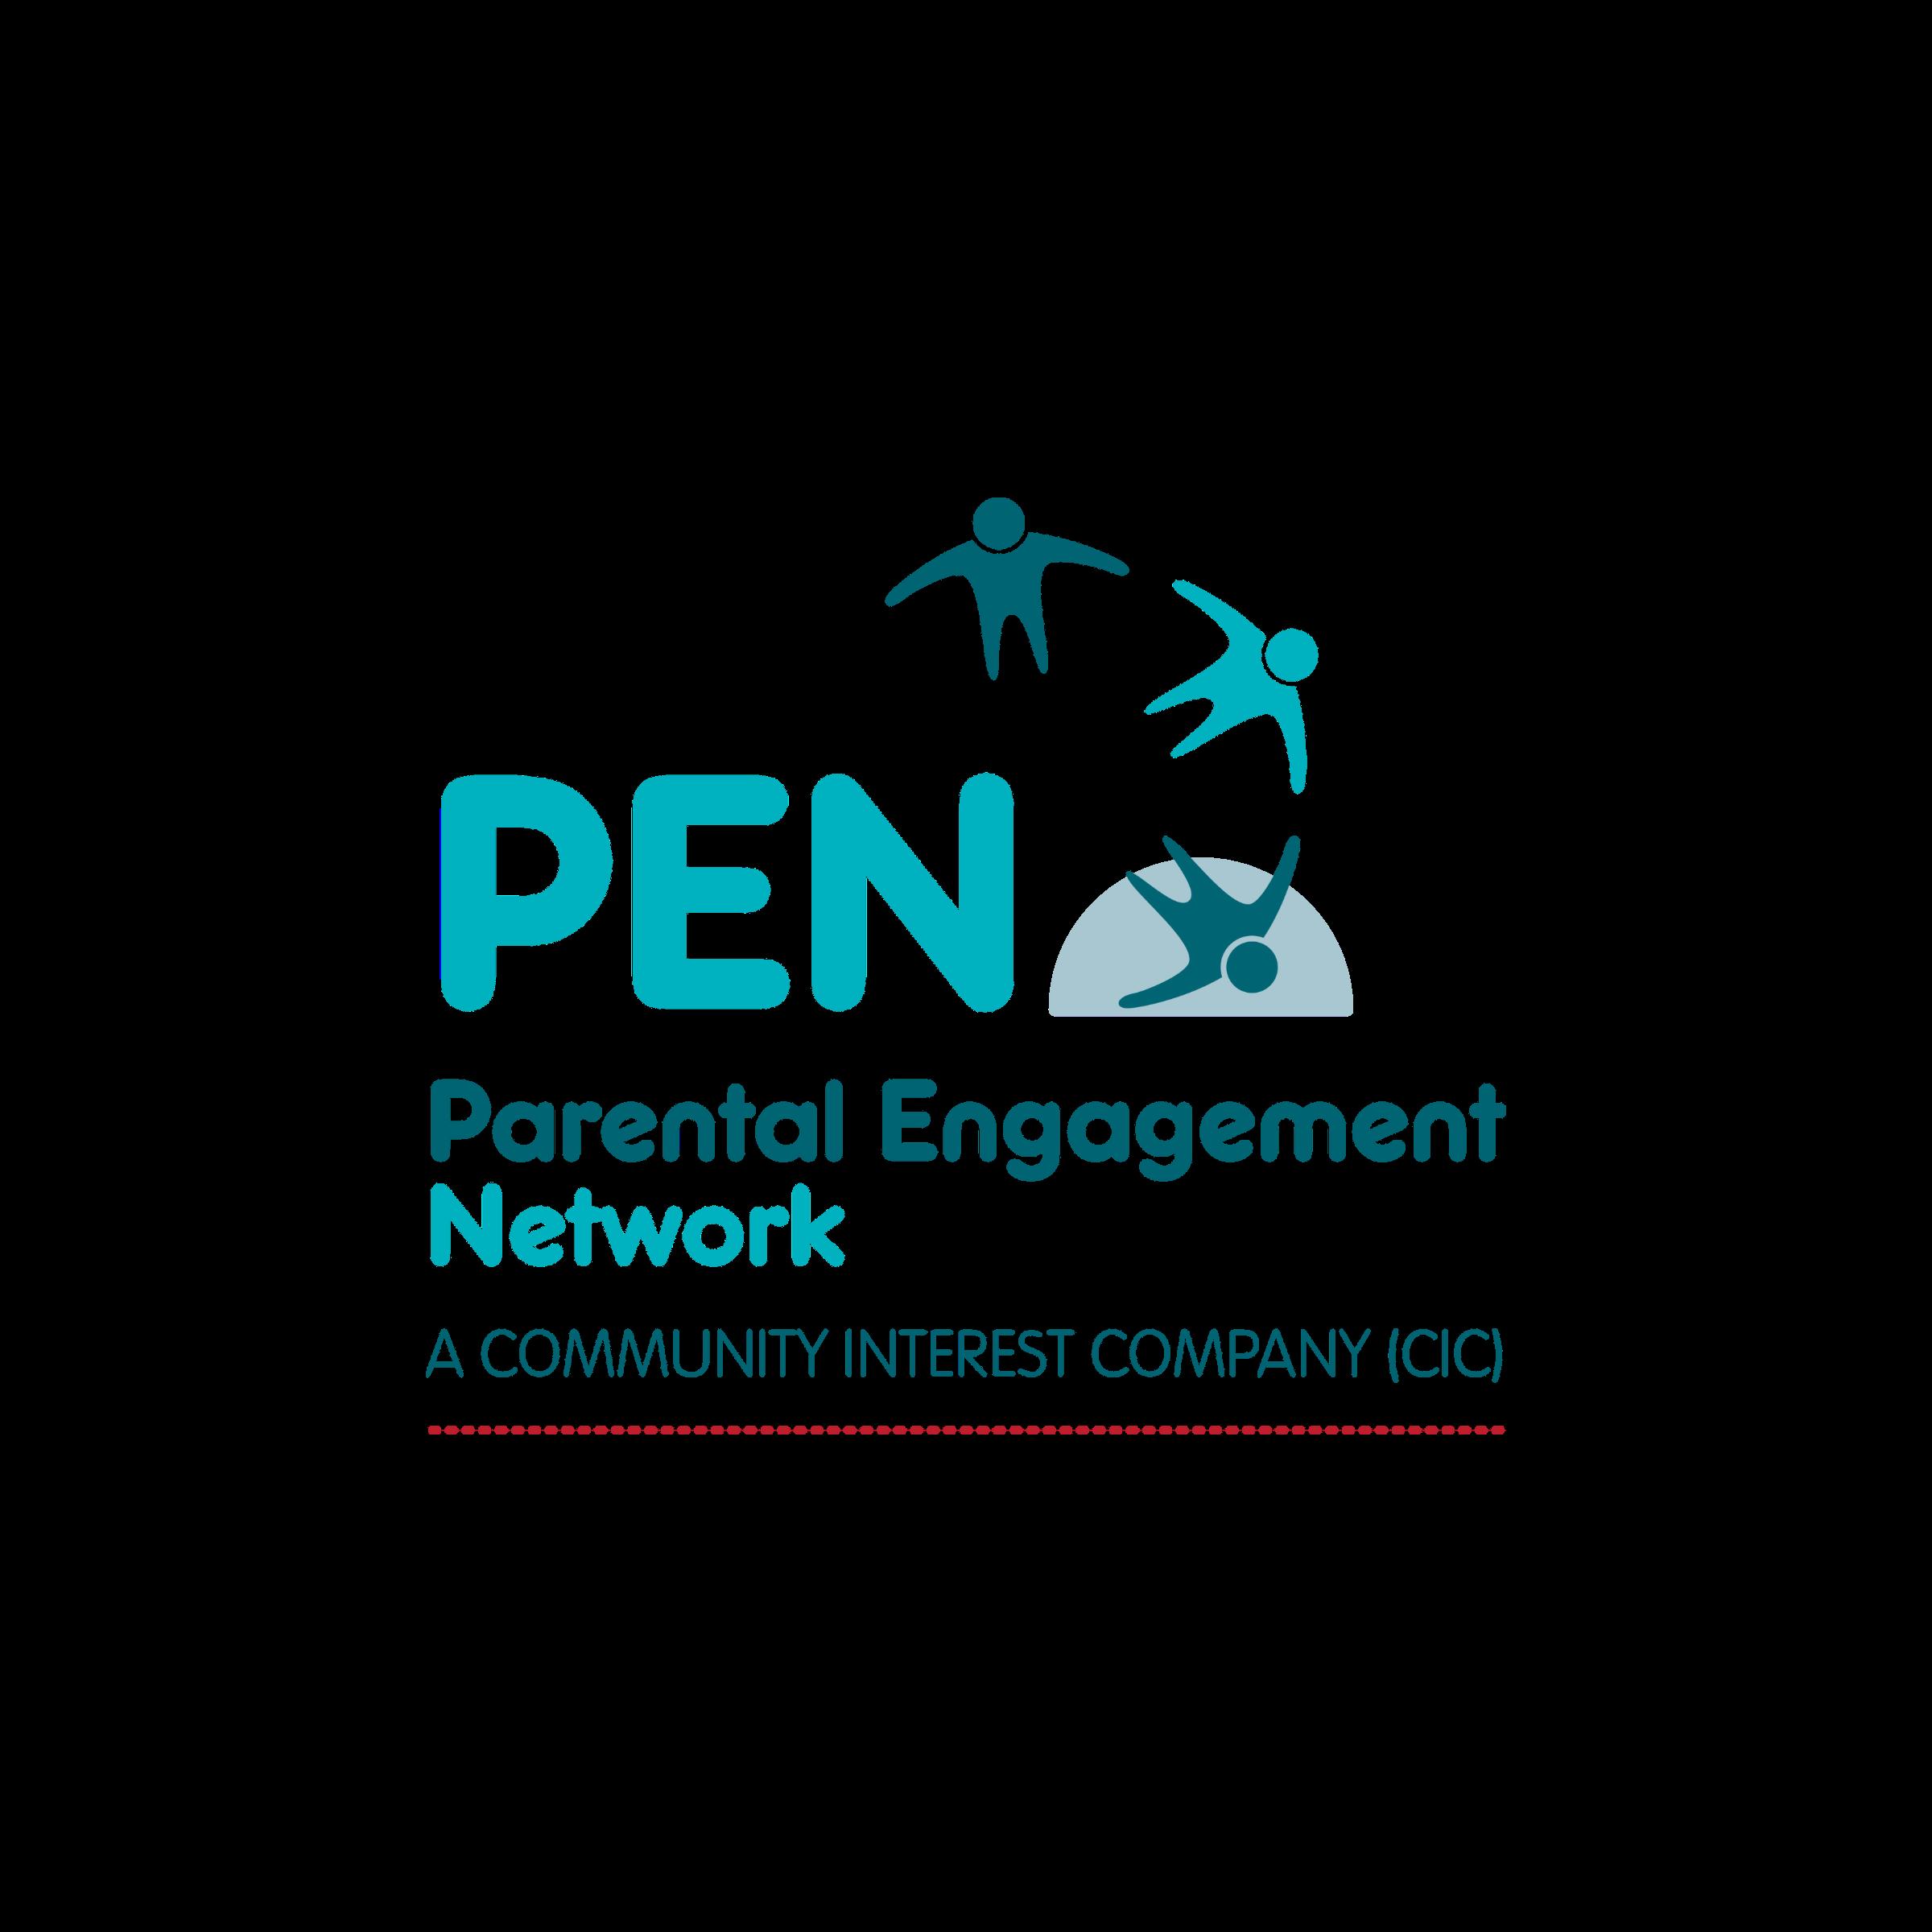 Parental Engagement Network